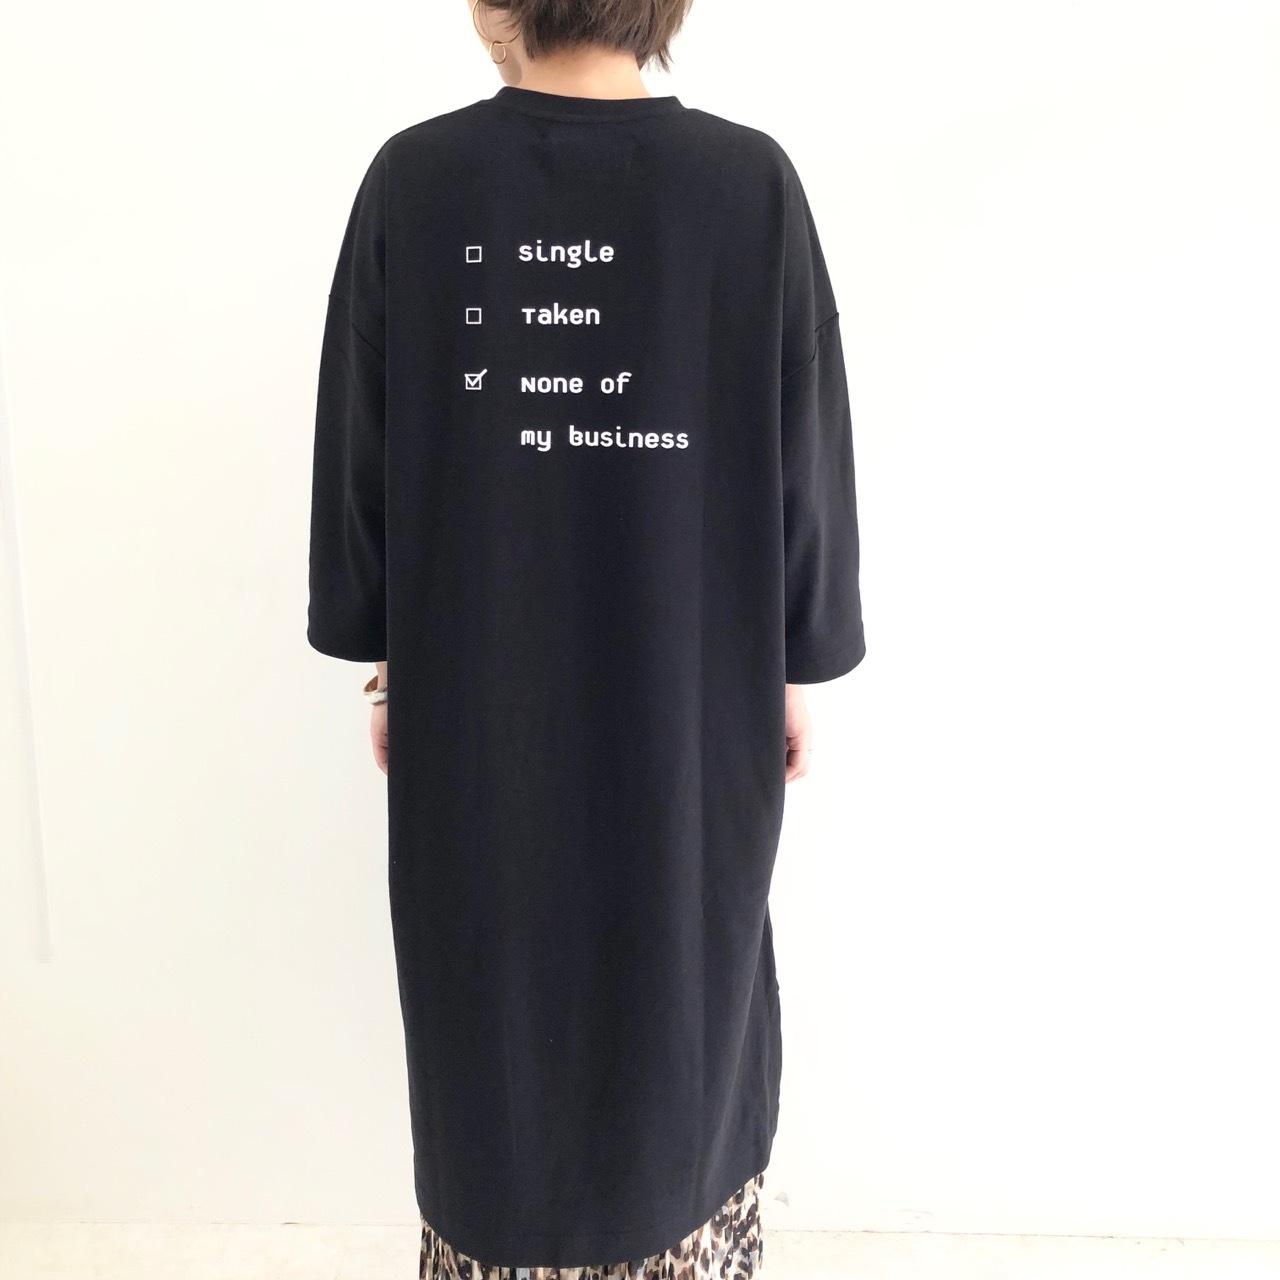 【 THOMAS MAGPIE 】- 2193808 - バックプリントワンピース